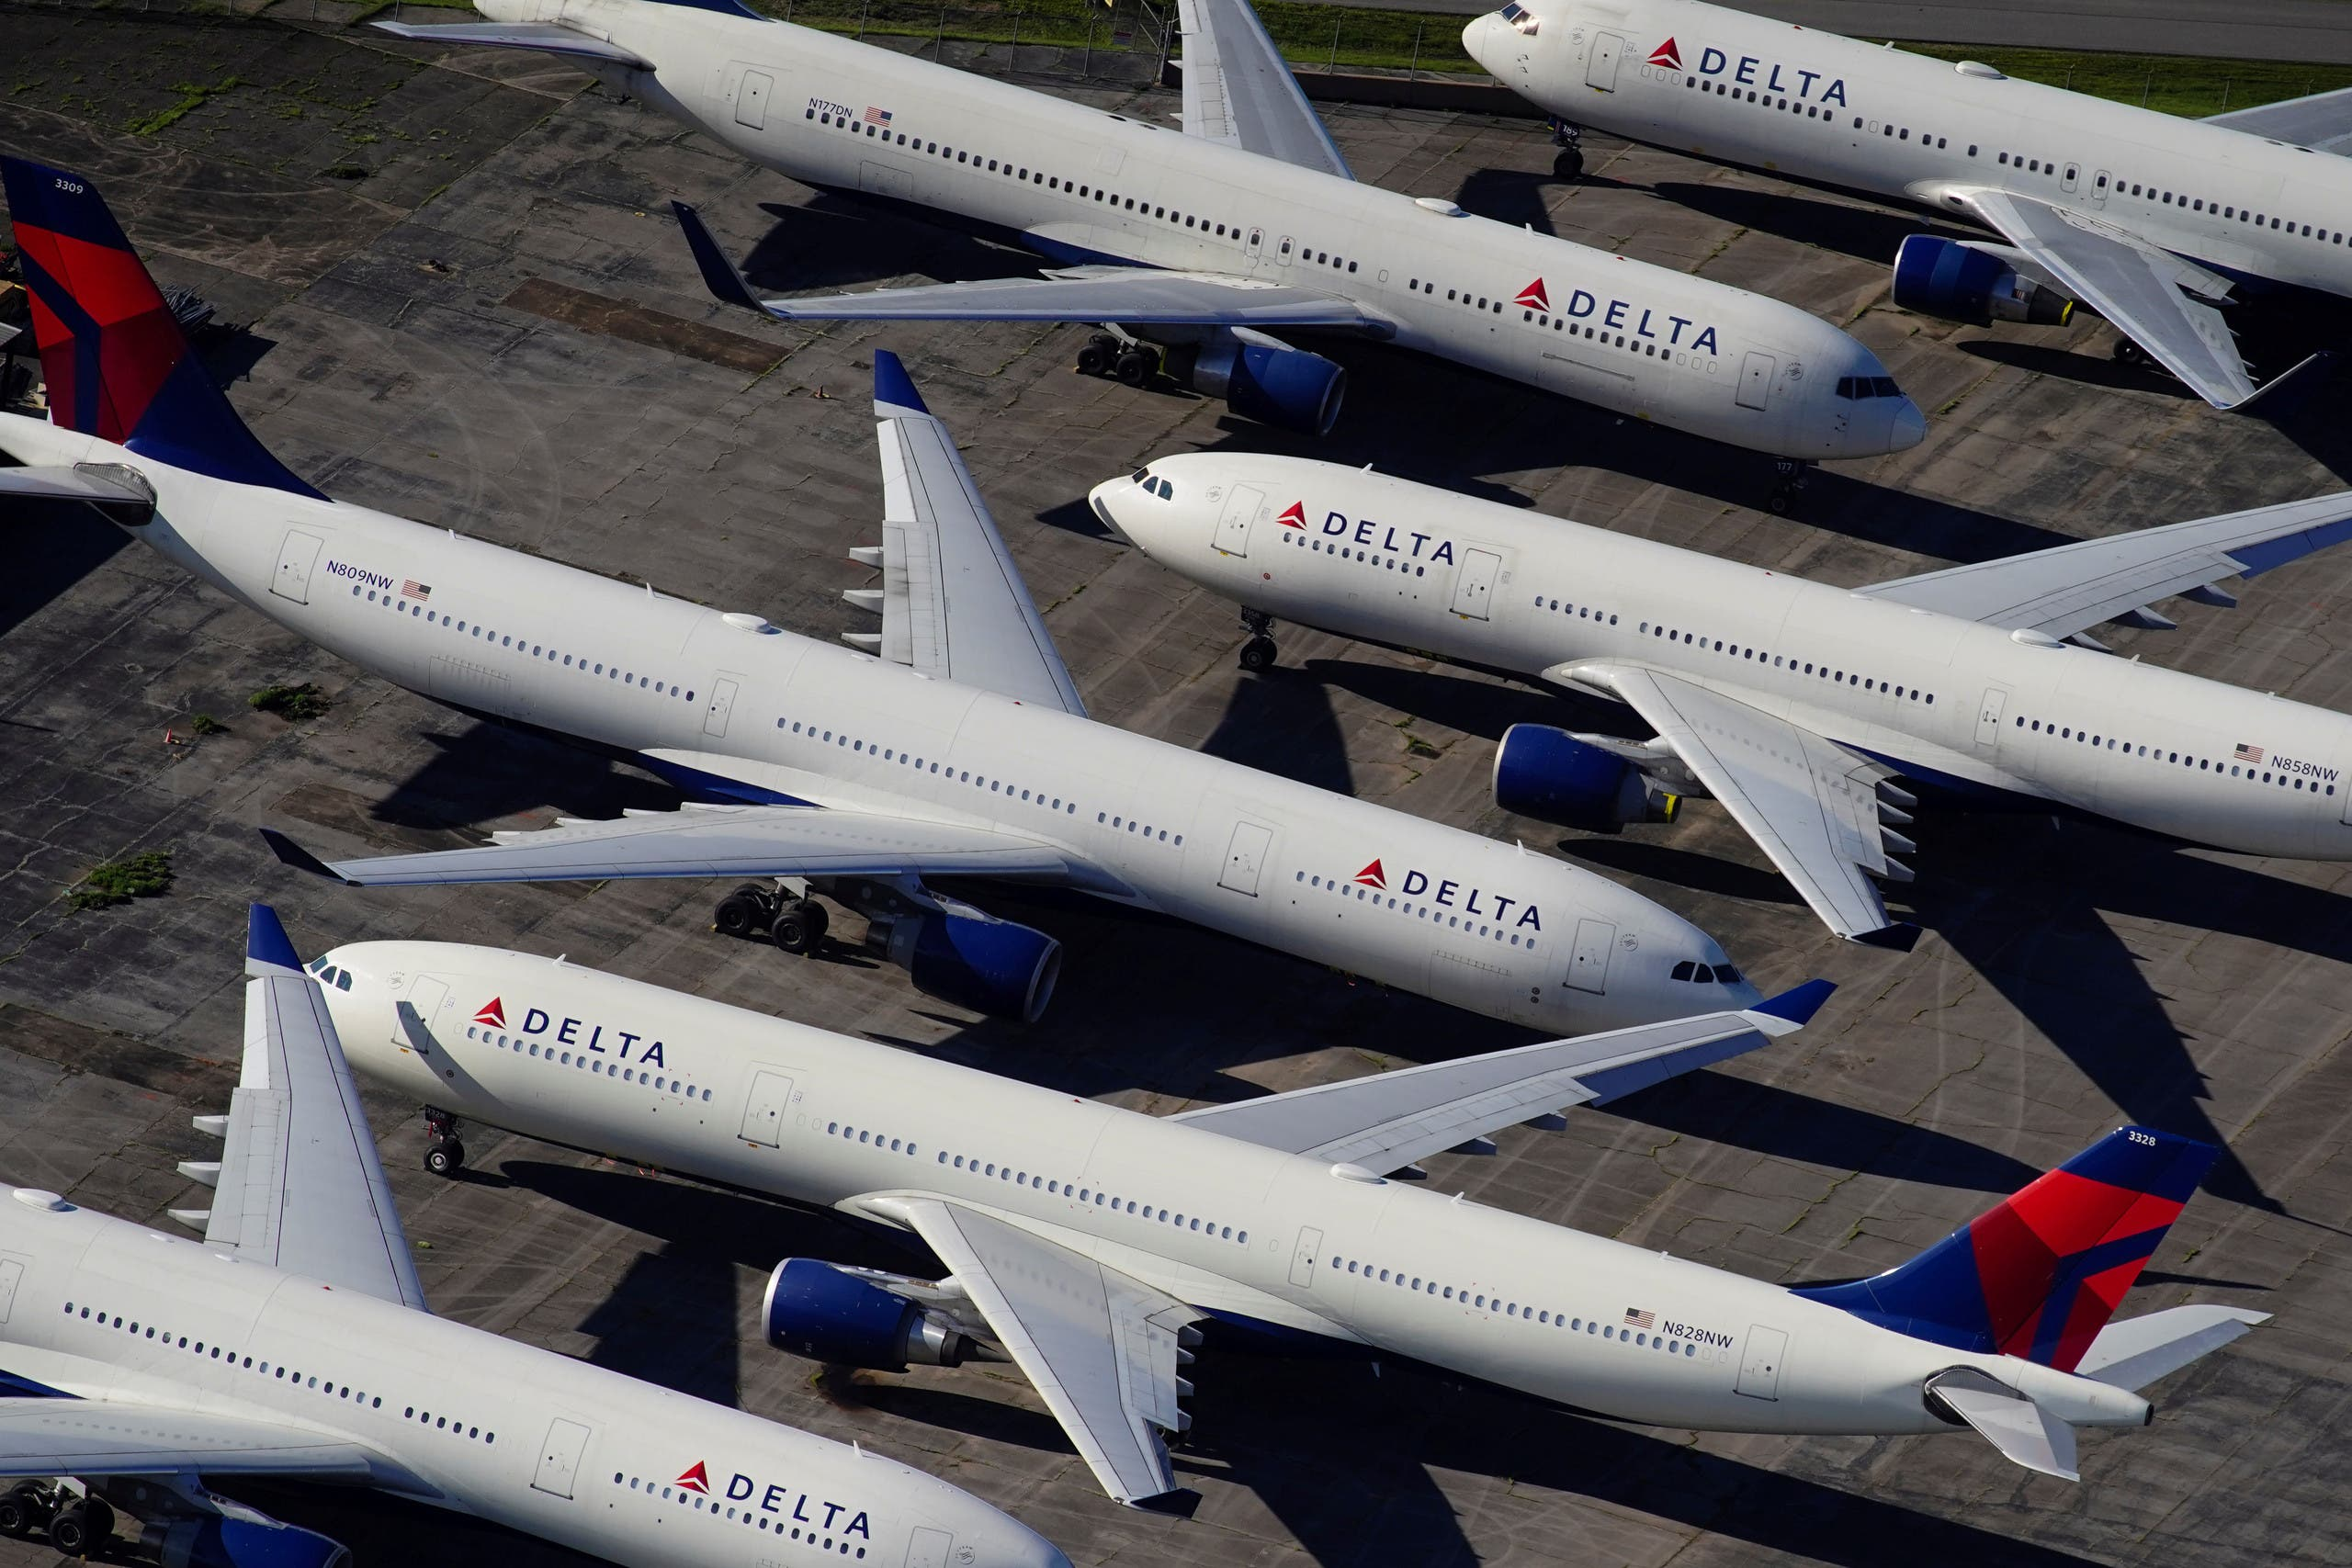 Delta Air Lines passenger planes parked at Birmingham-Shuttlesworth International Airport due to the coronavirus pandemic. (File photo: Reuters)